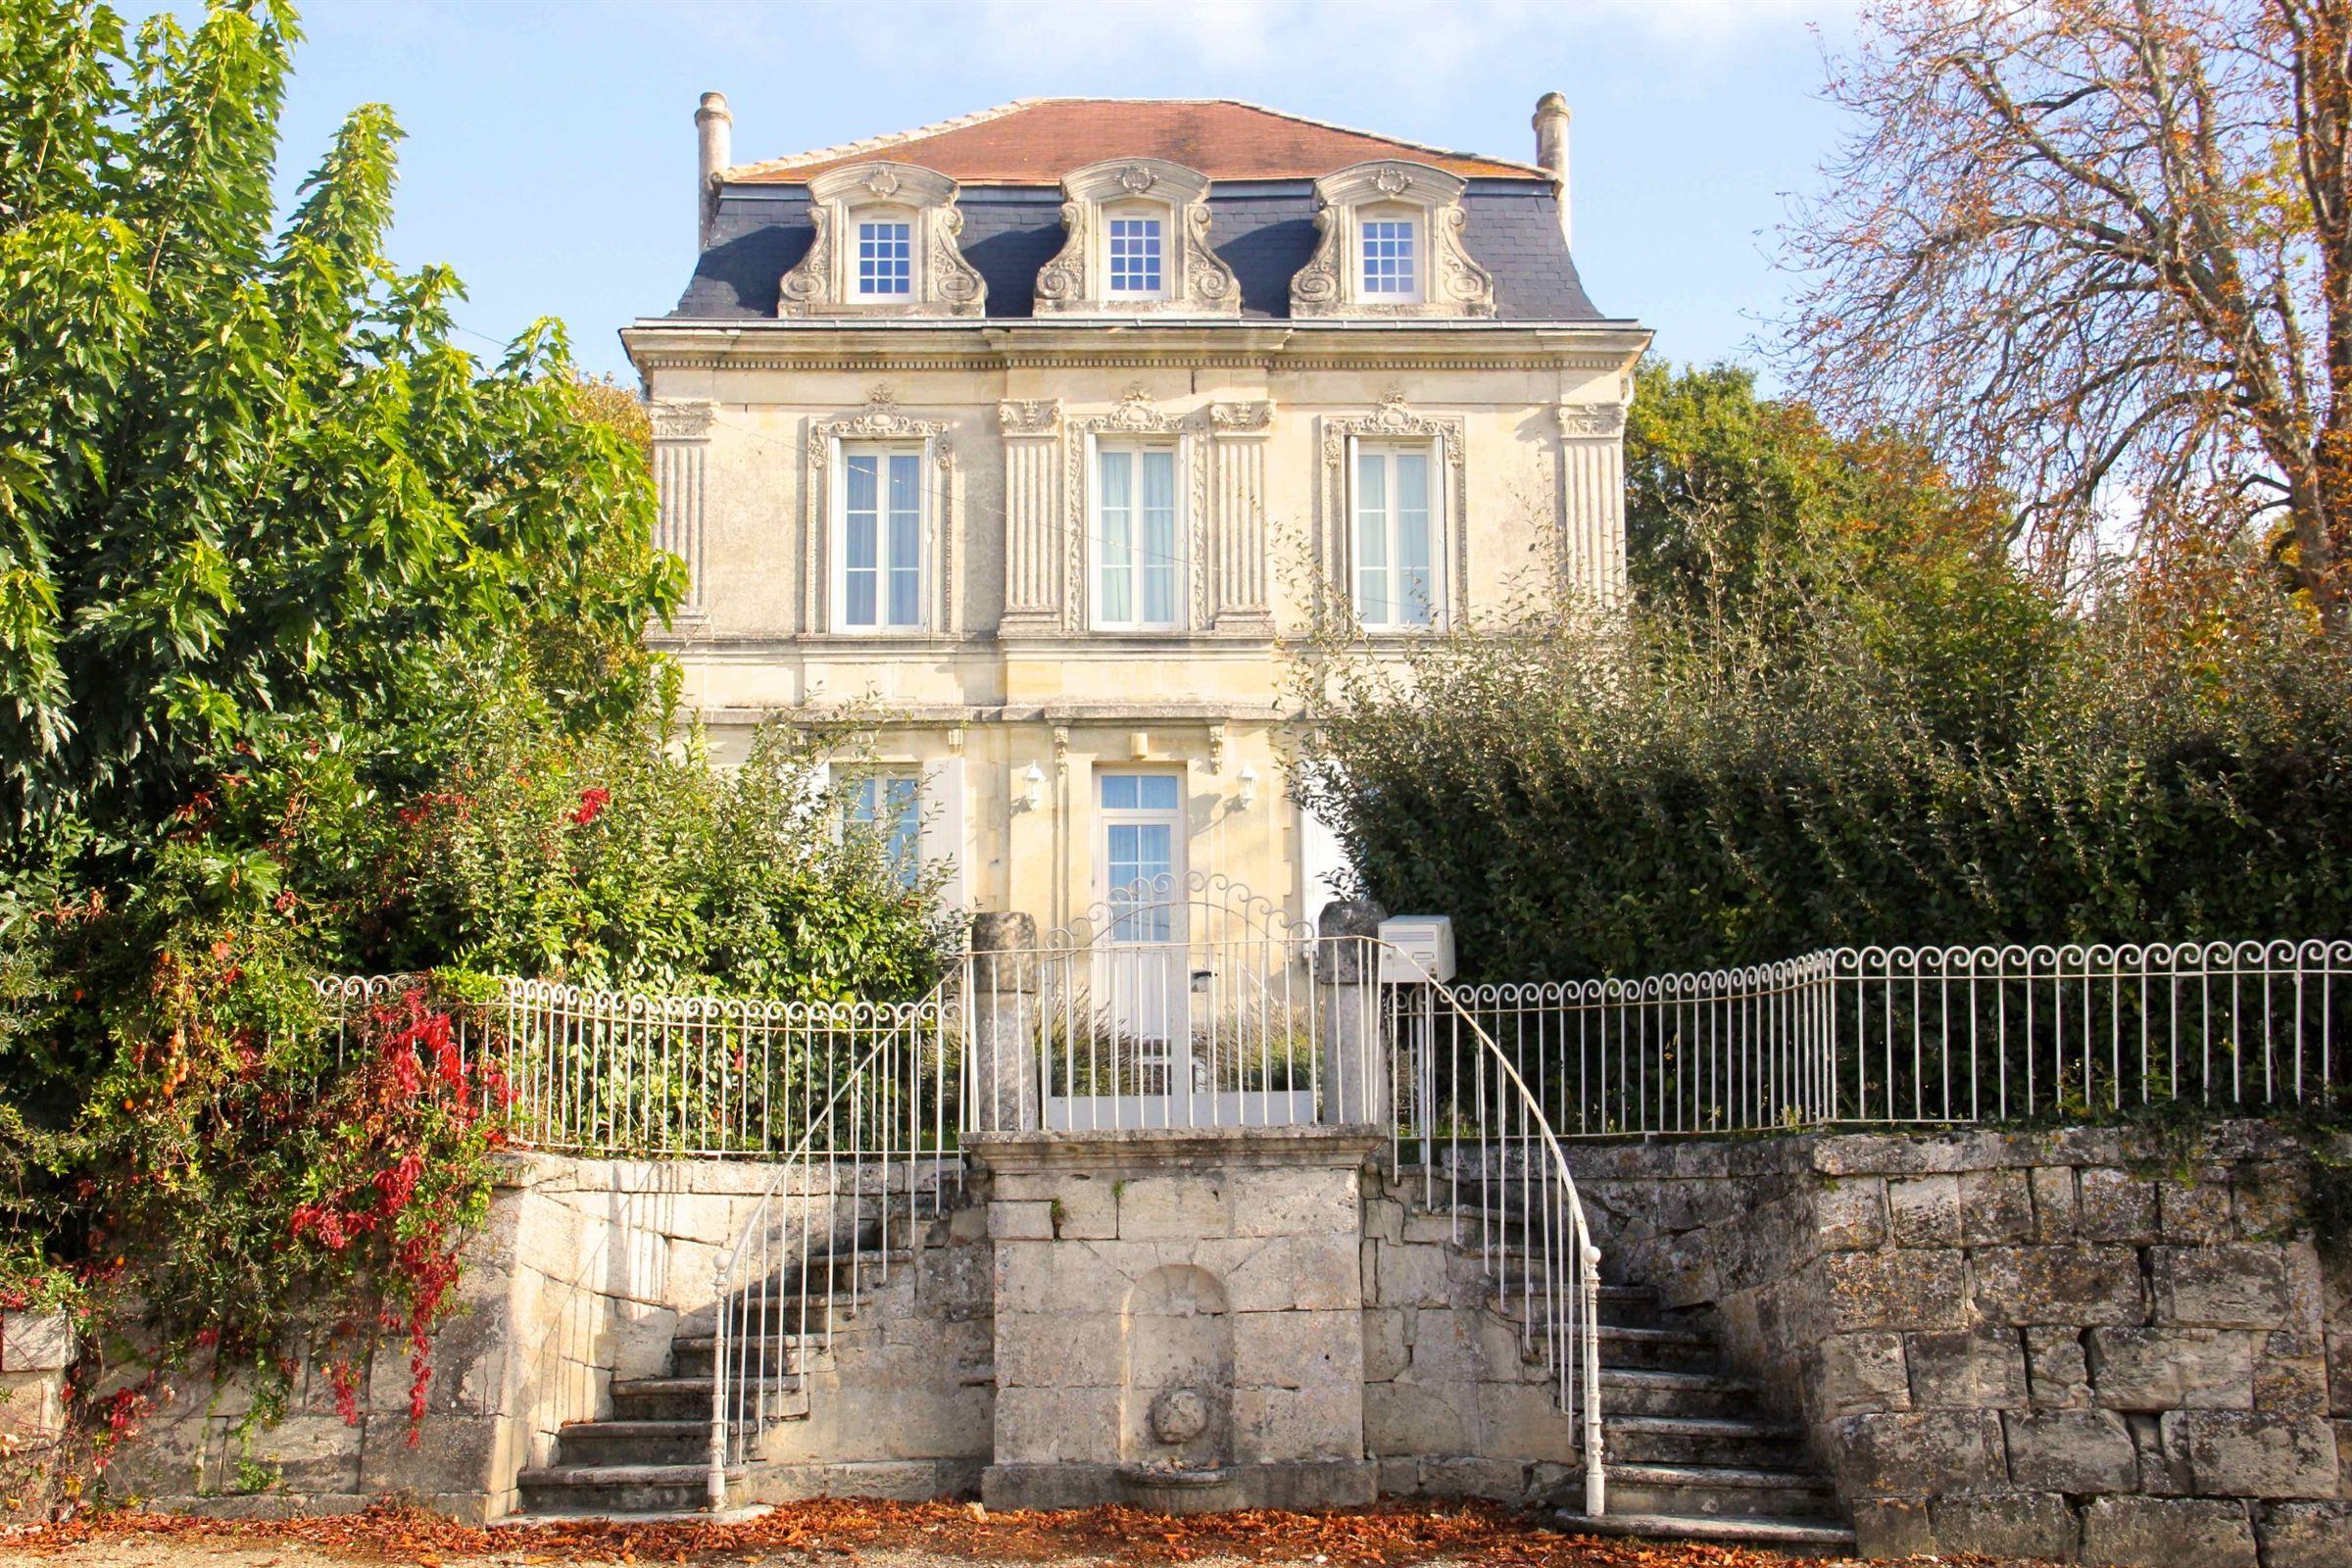 Villa per Vendita alle ore BORDEAUX - FRONSAC - ELEGANT AND CHARMING MASTER HOUSE B N B Bordeaux, Aquitania, 33000 Francia